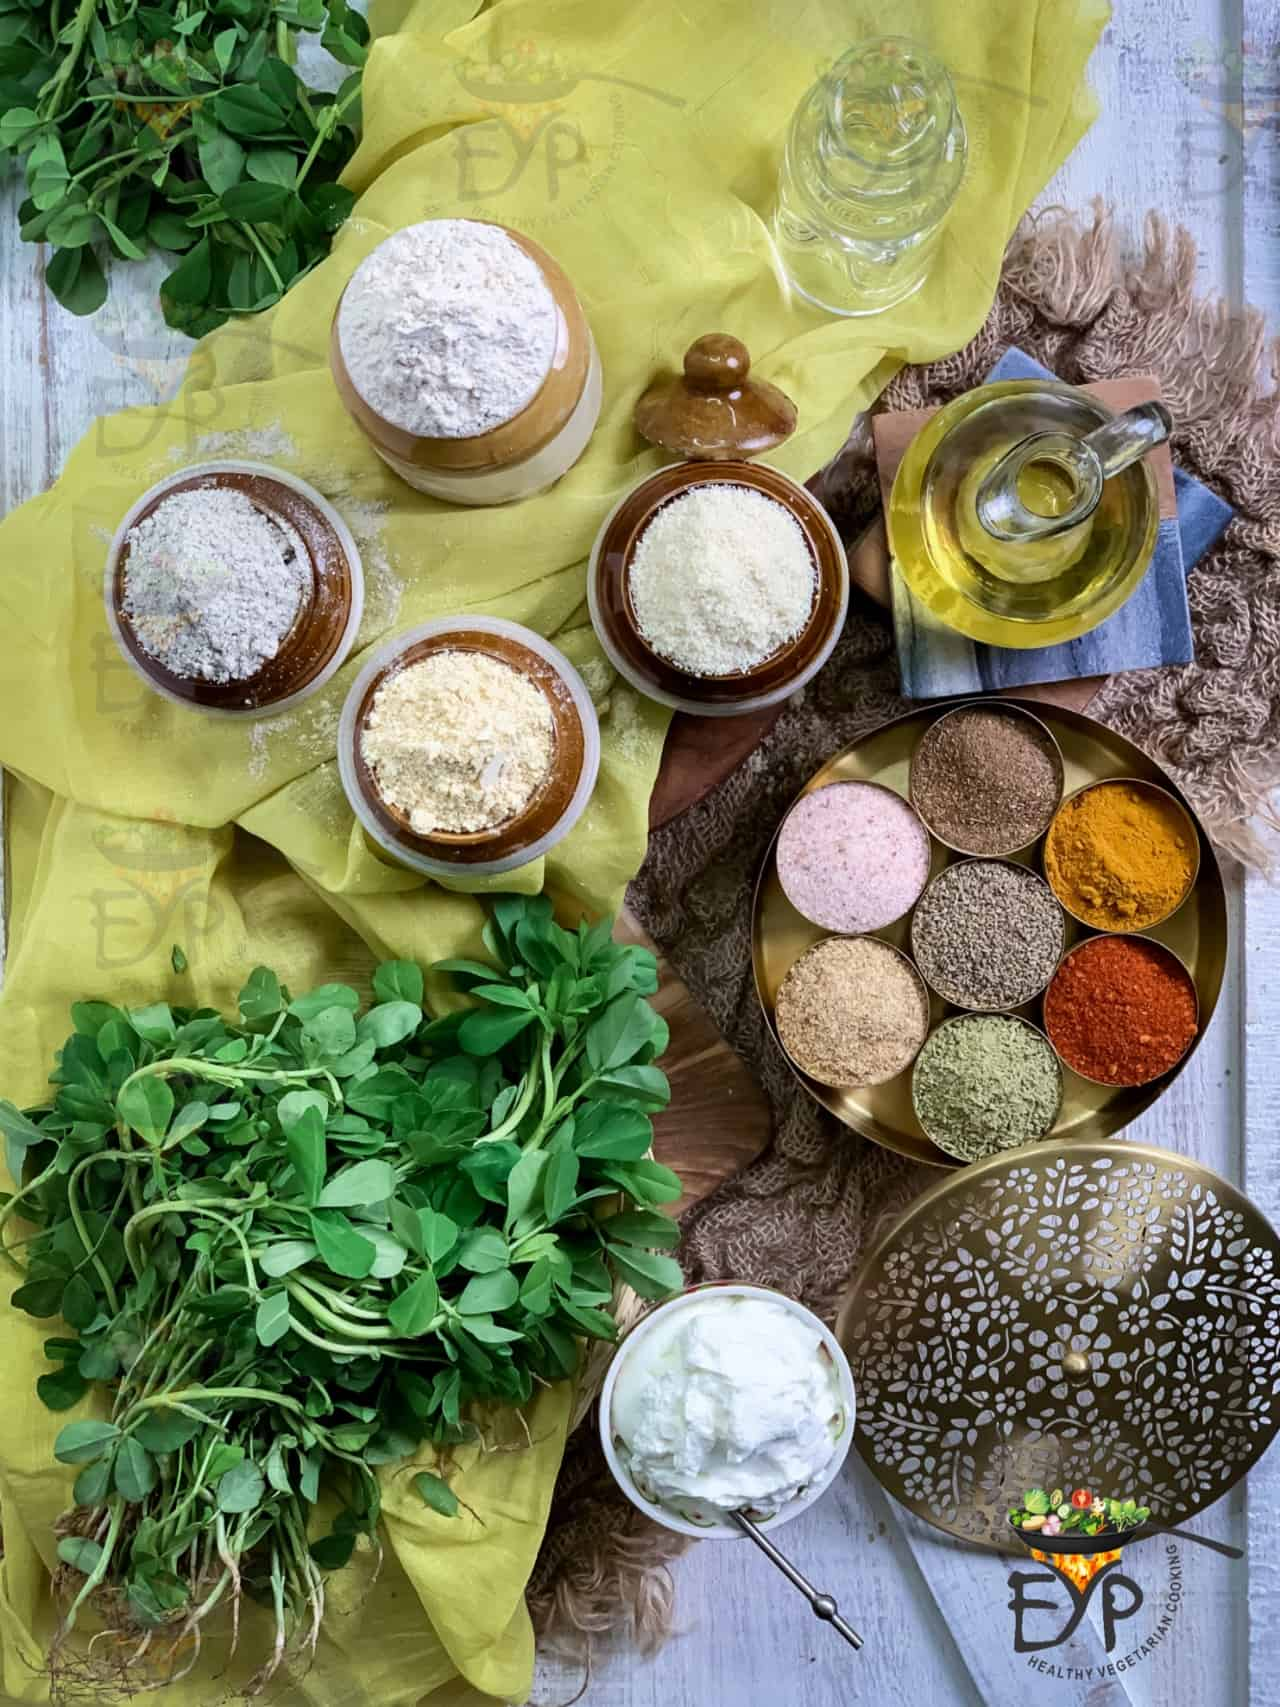 Ingredients for dal-dhokli